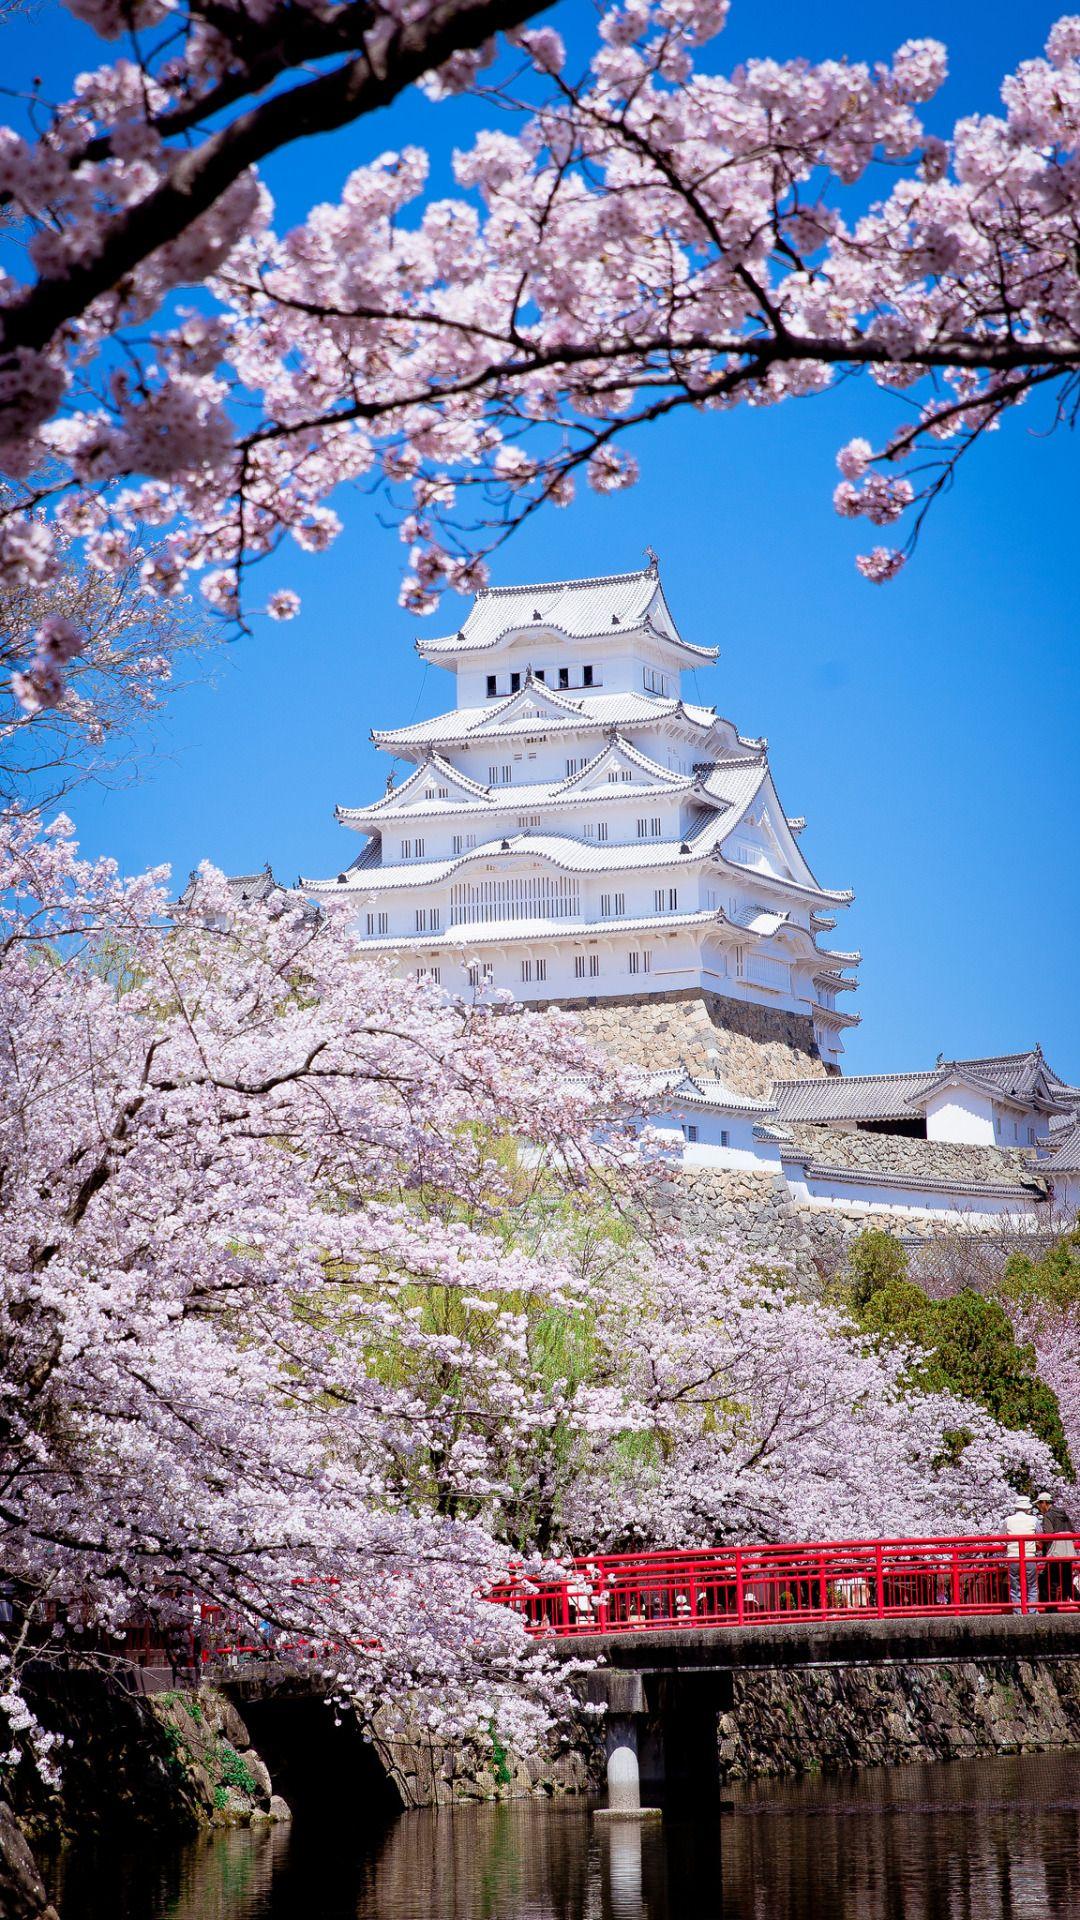 Japan Overload By Peiminwu Japan Landscape Japanese Landscape Japan Photography